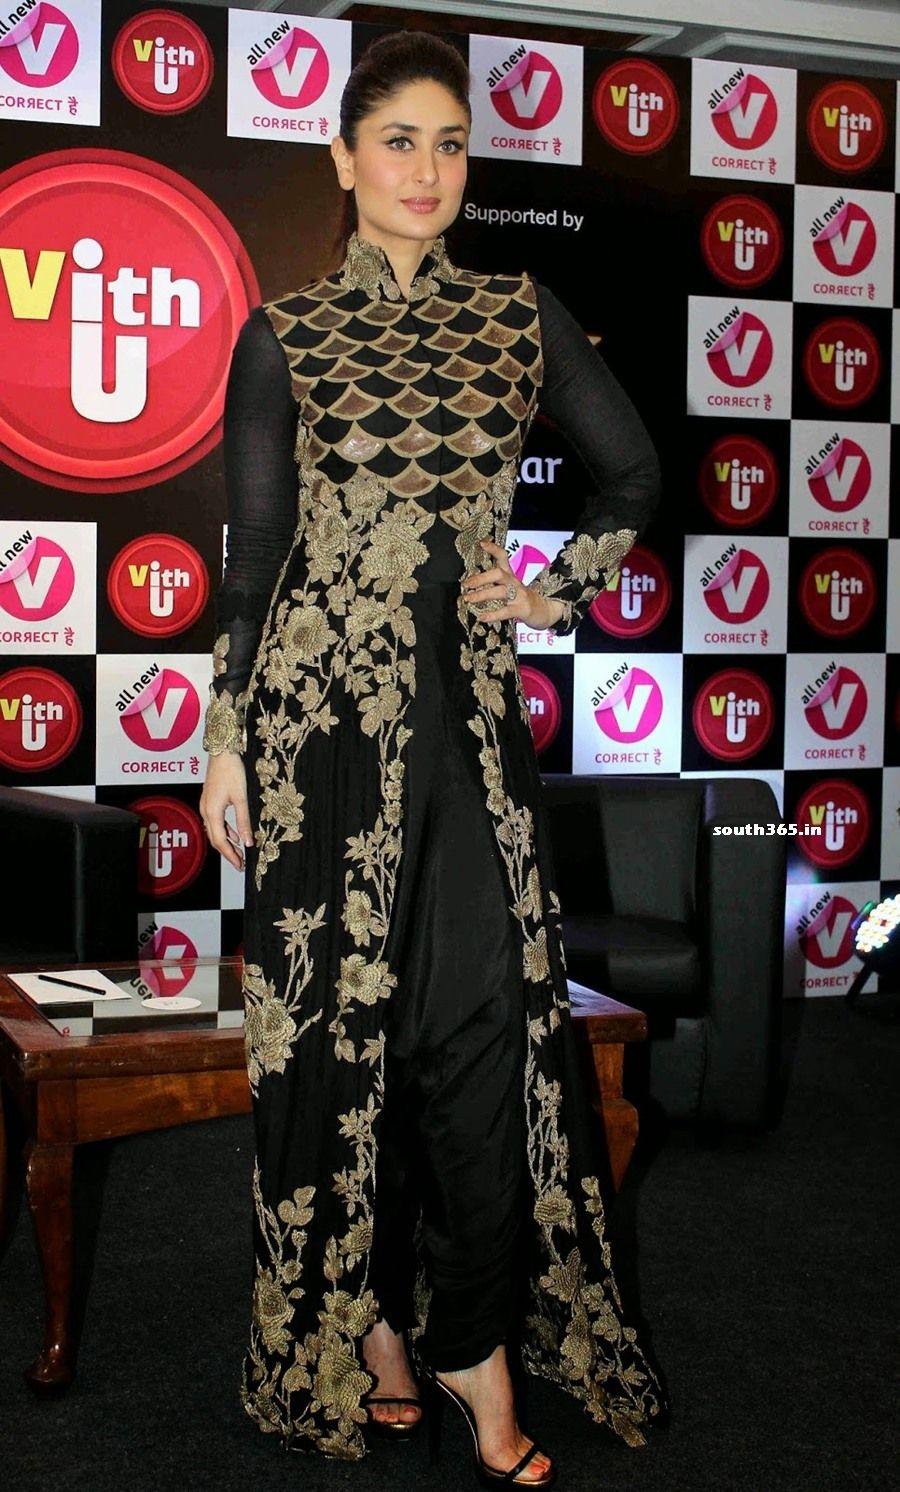 Black dress kareena kapoor - Image Result For Kareena Kapoor Dress